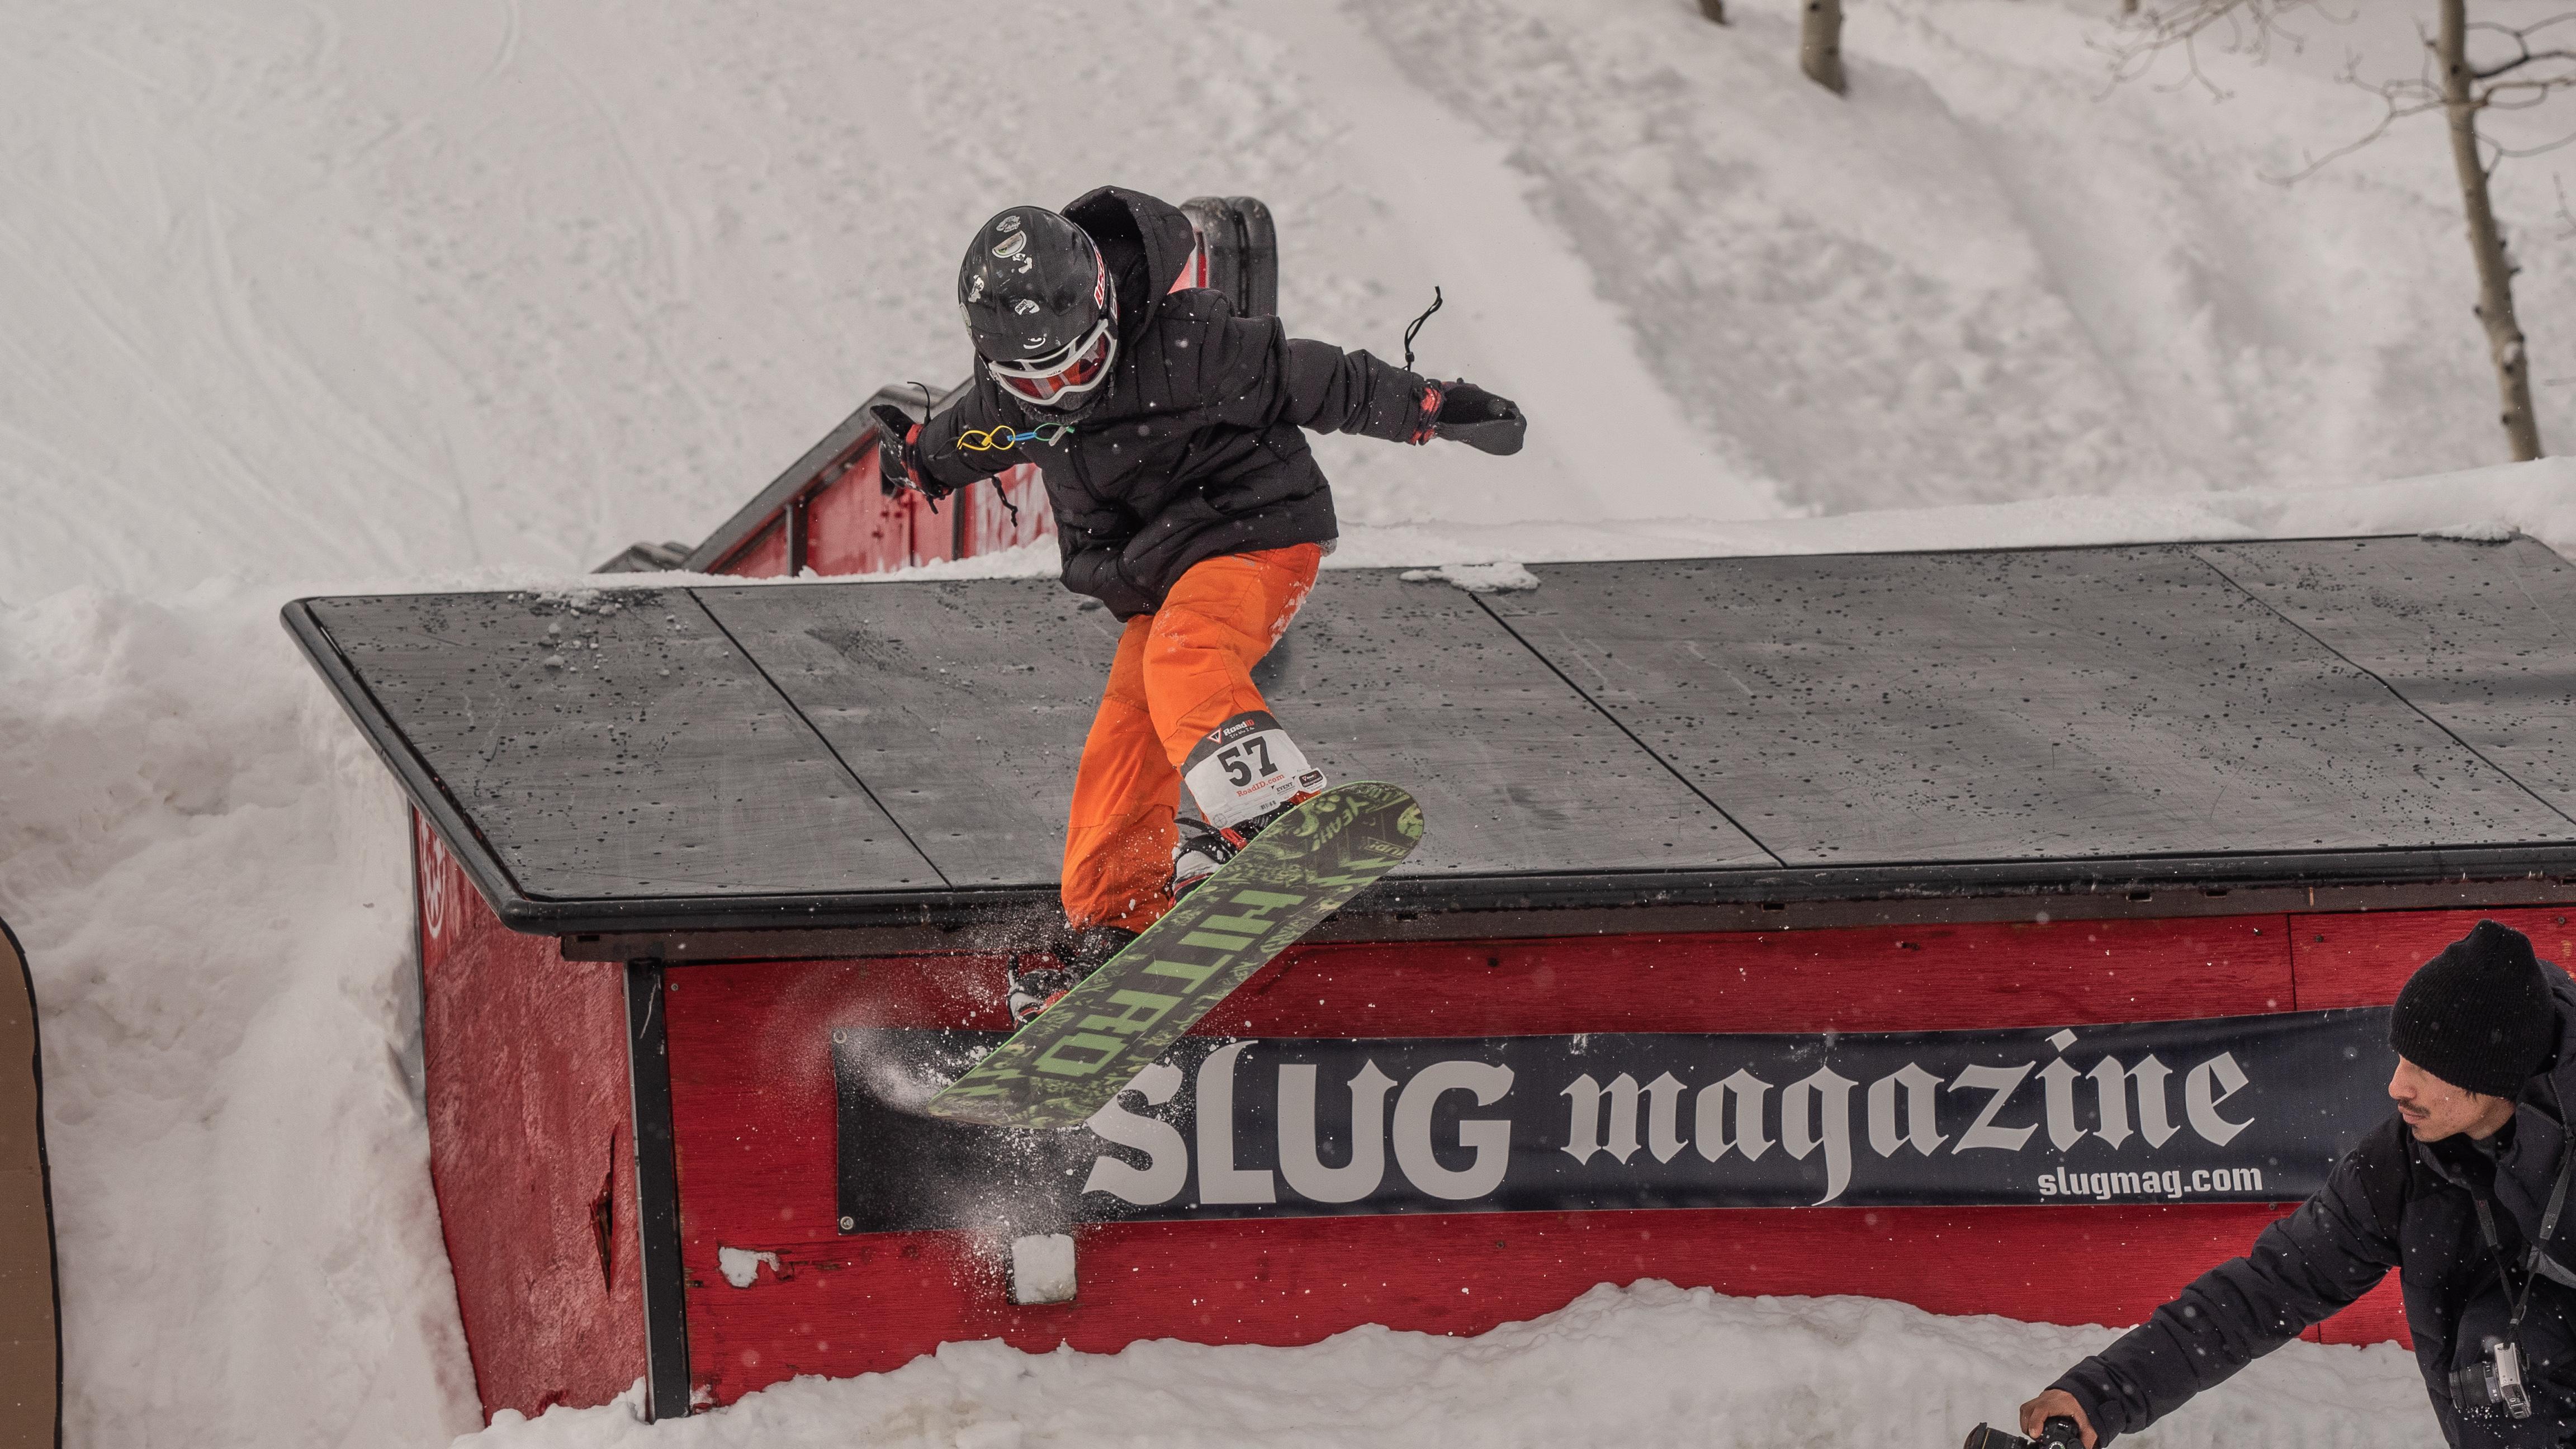 Ashton Davis during men's 17 and under snowboarding.